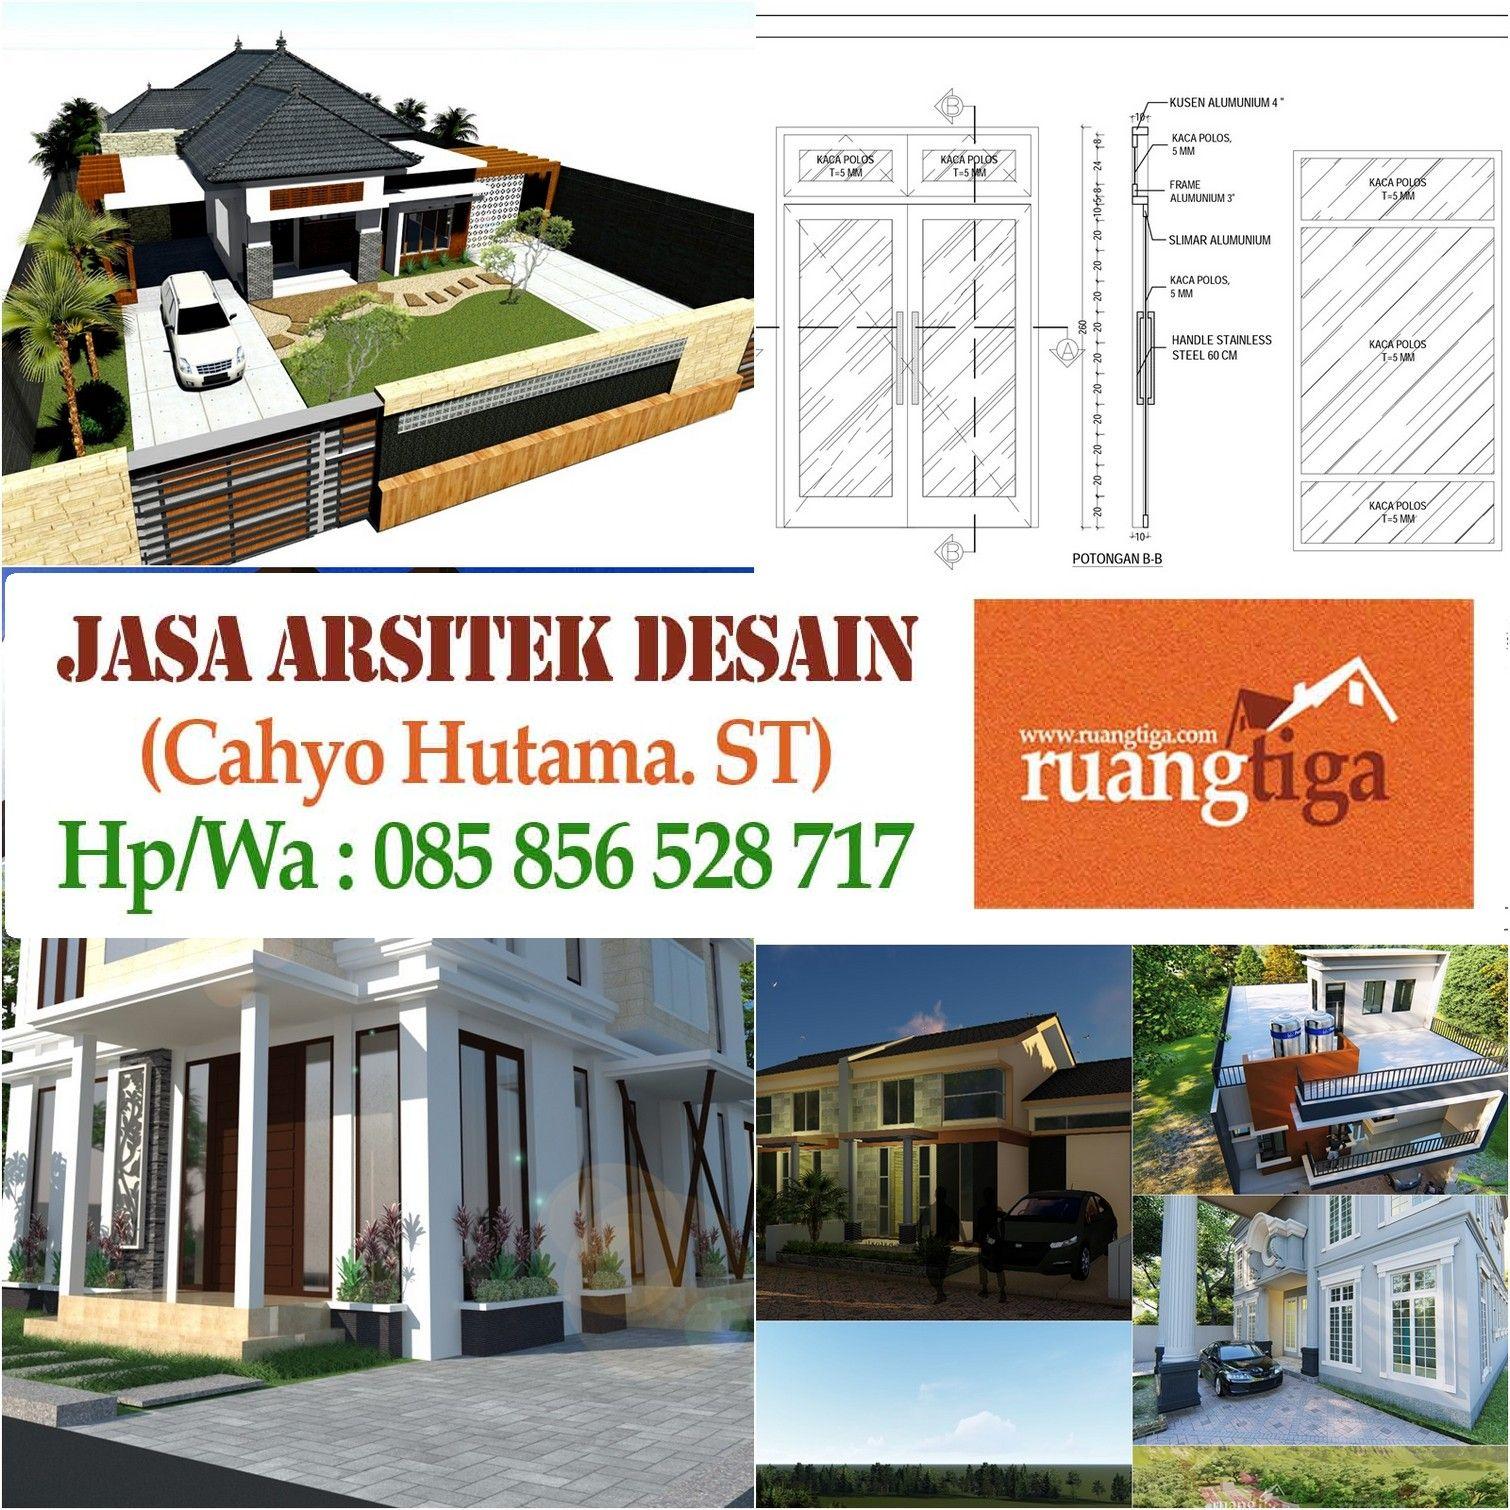 085856528717 Jasa Arsitektur rumah mungil Jasa desain